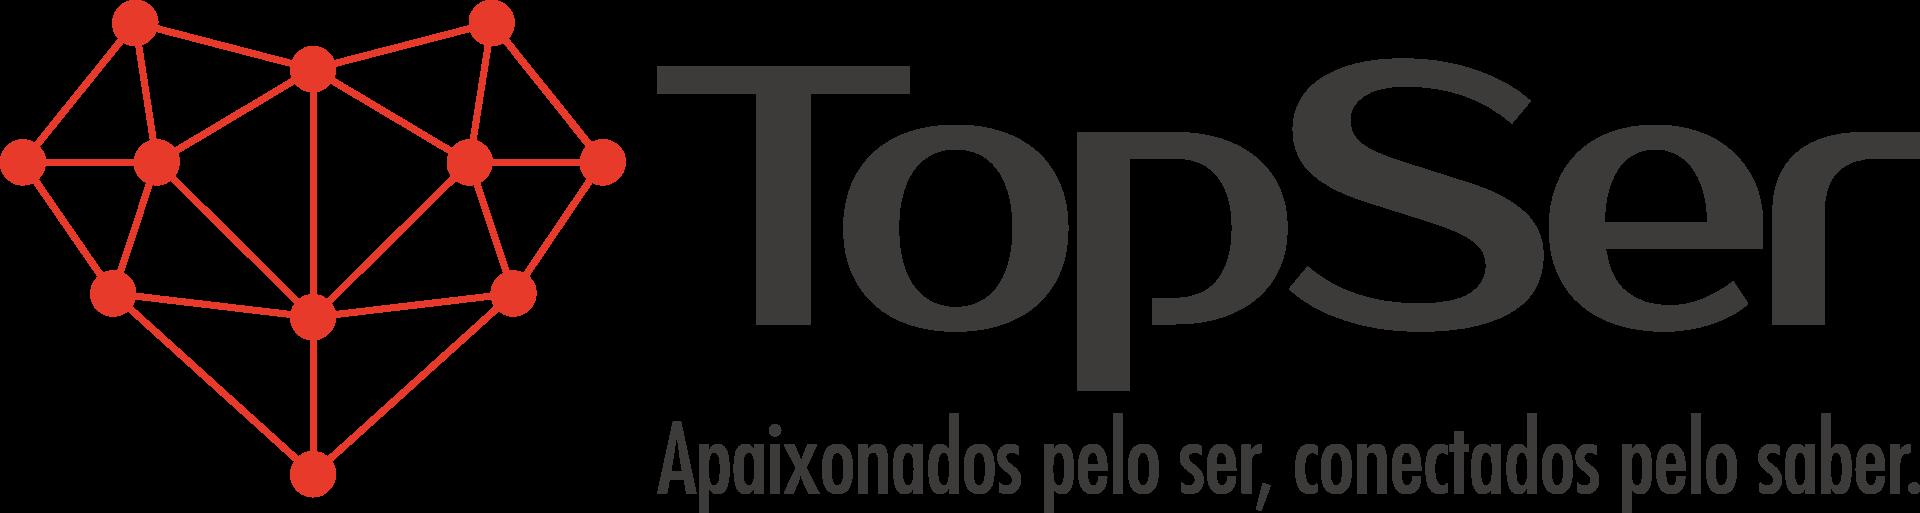 Topser